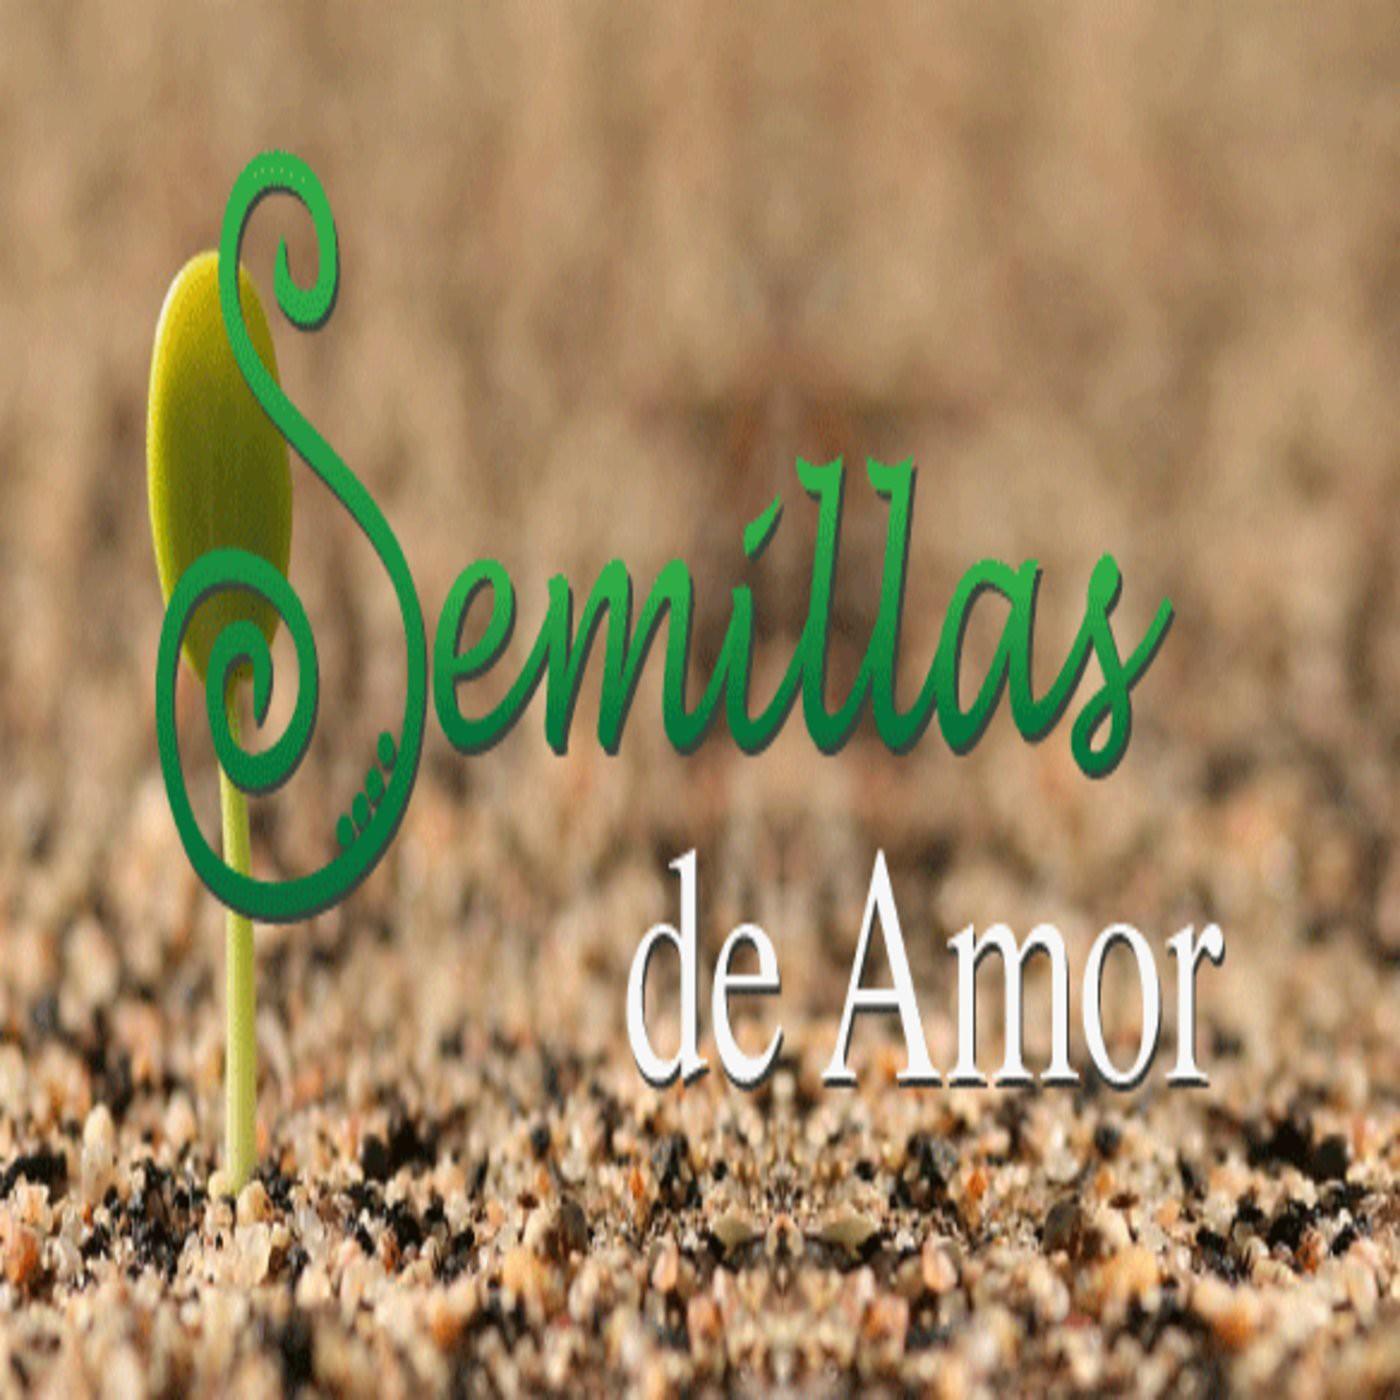 <![CDATA[Iglesia Semillas de Amor]]>